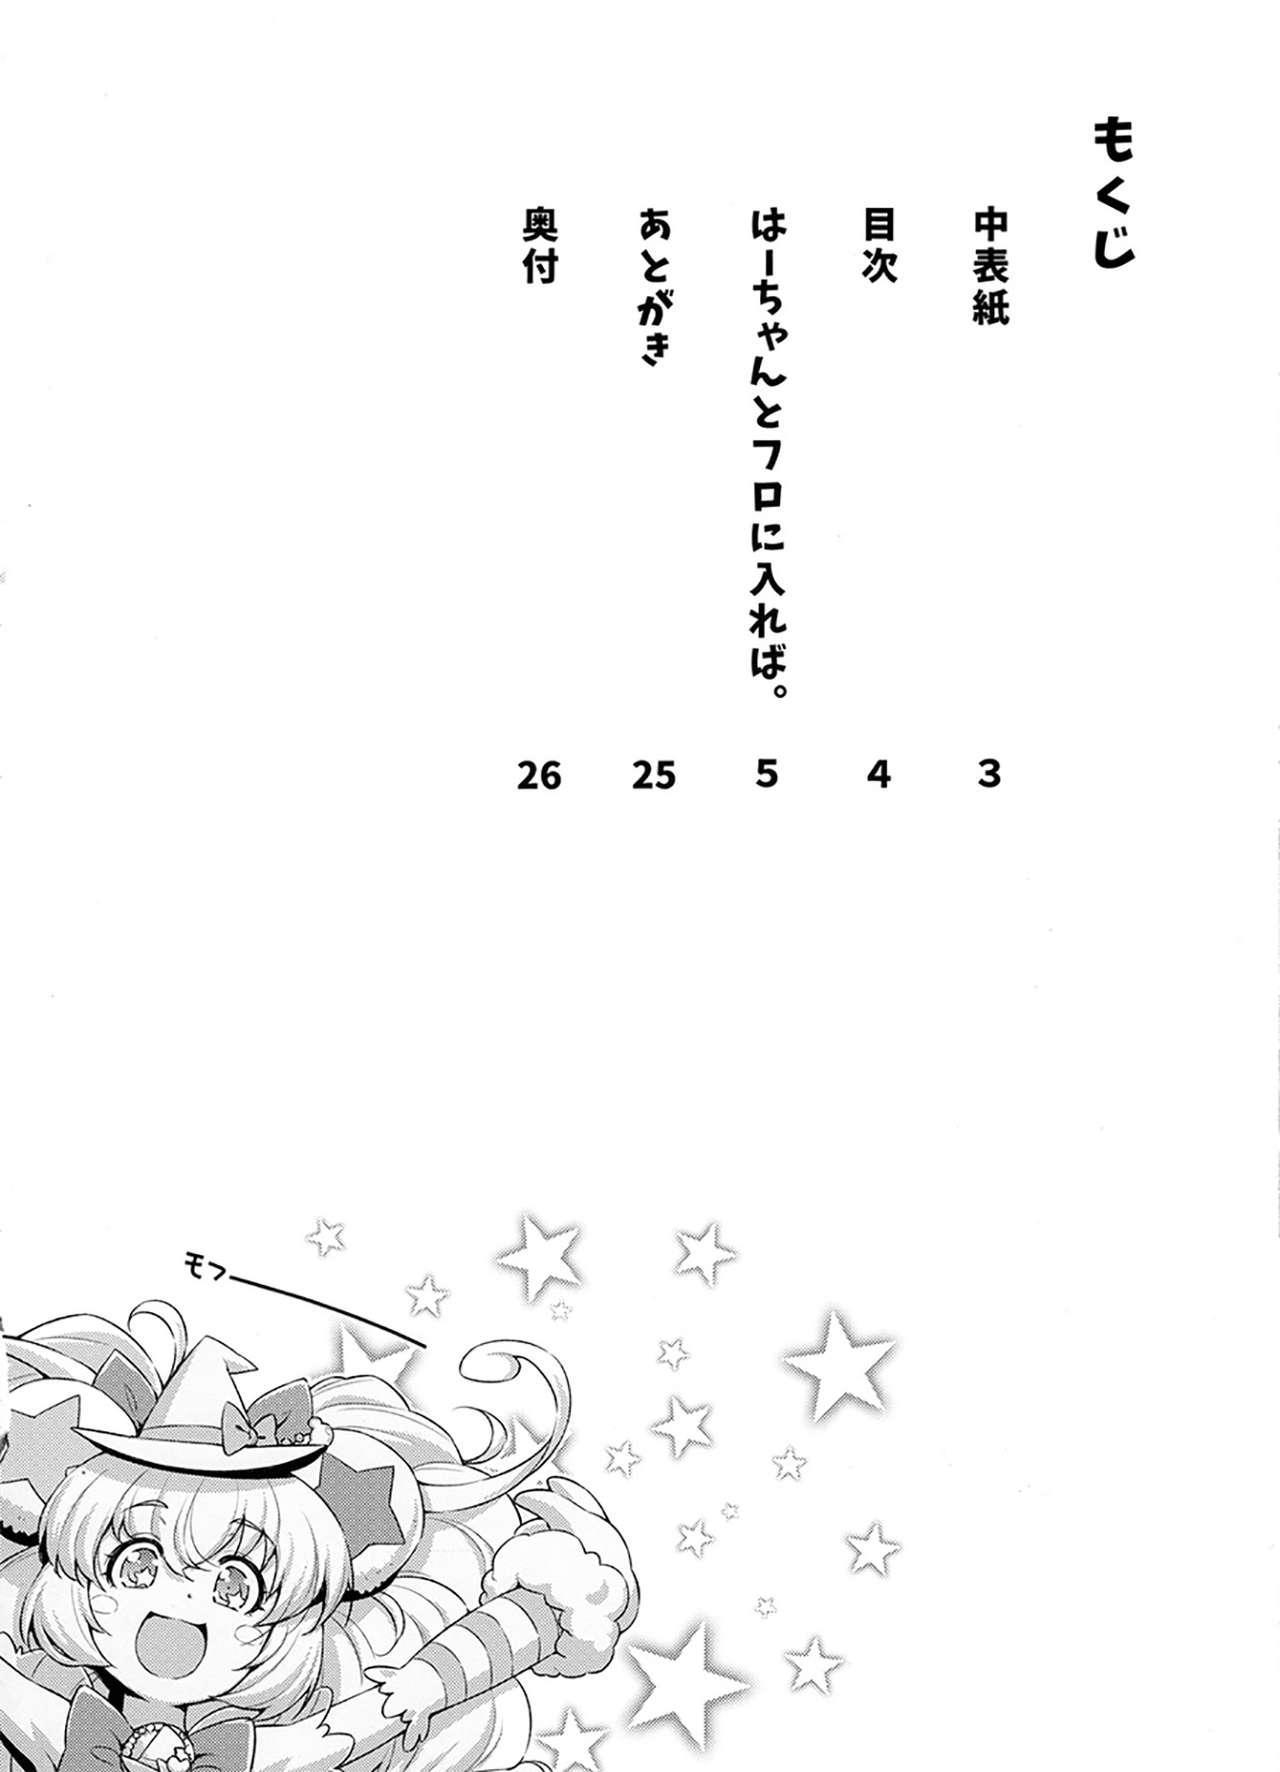 (C91) [ACID EATERS (Kazuma Muramasa)] Haa-chan to Furo ni Haireba.   Taking a Bath With Ha-chan. (Mahou Tsukai Precure!) [English] [nisashi13 + MaxChronos] 2